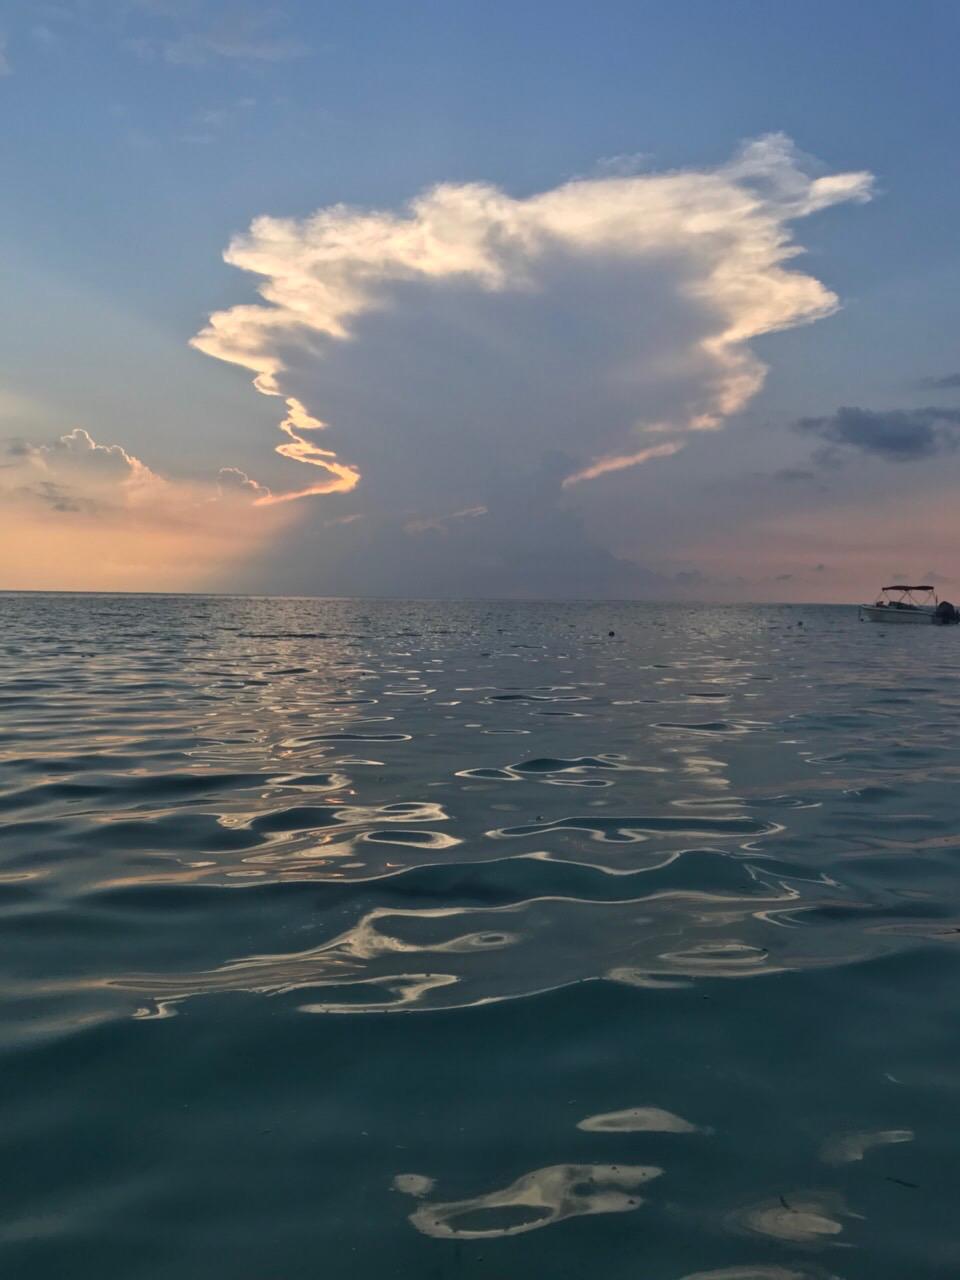 Night fishing thoddoo maldives ночная рыбалка мальдивы тодду